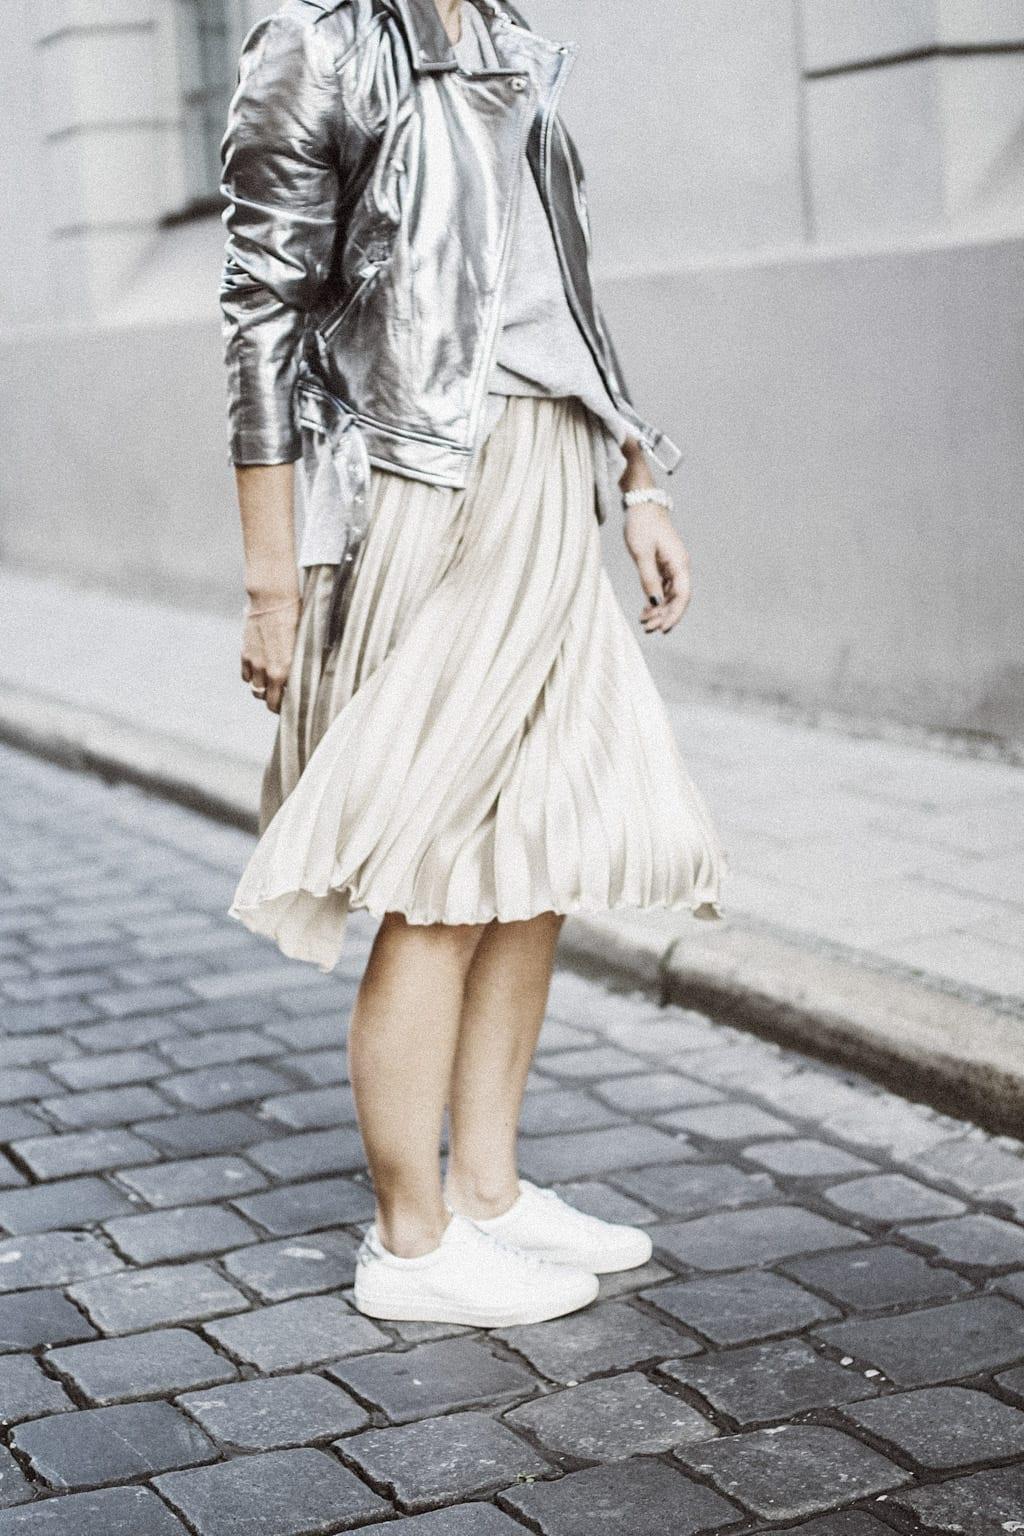 ck-constantlyk-com-karin-kaswurm-street-style-fashion-silver-leather-jacket-plissee-6870